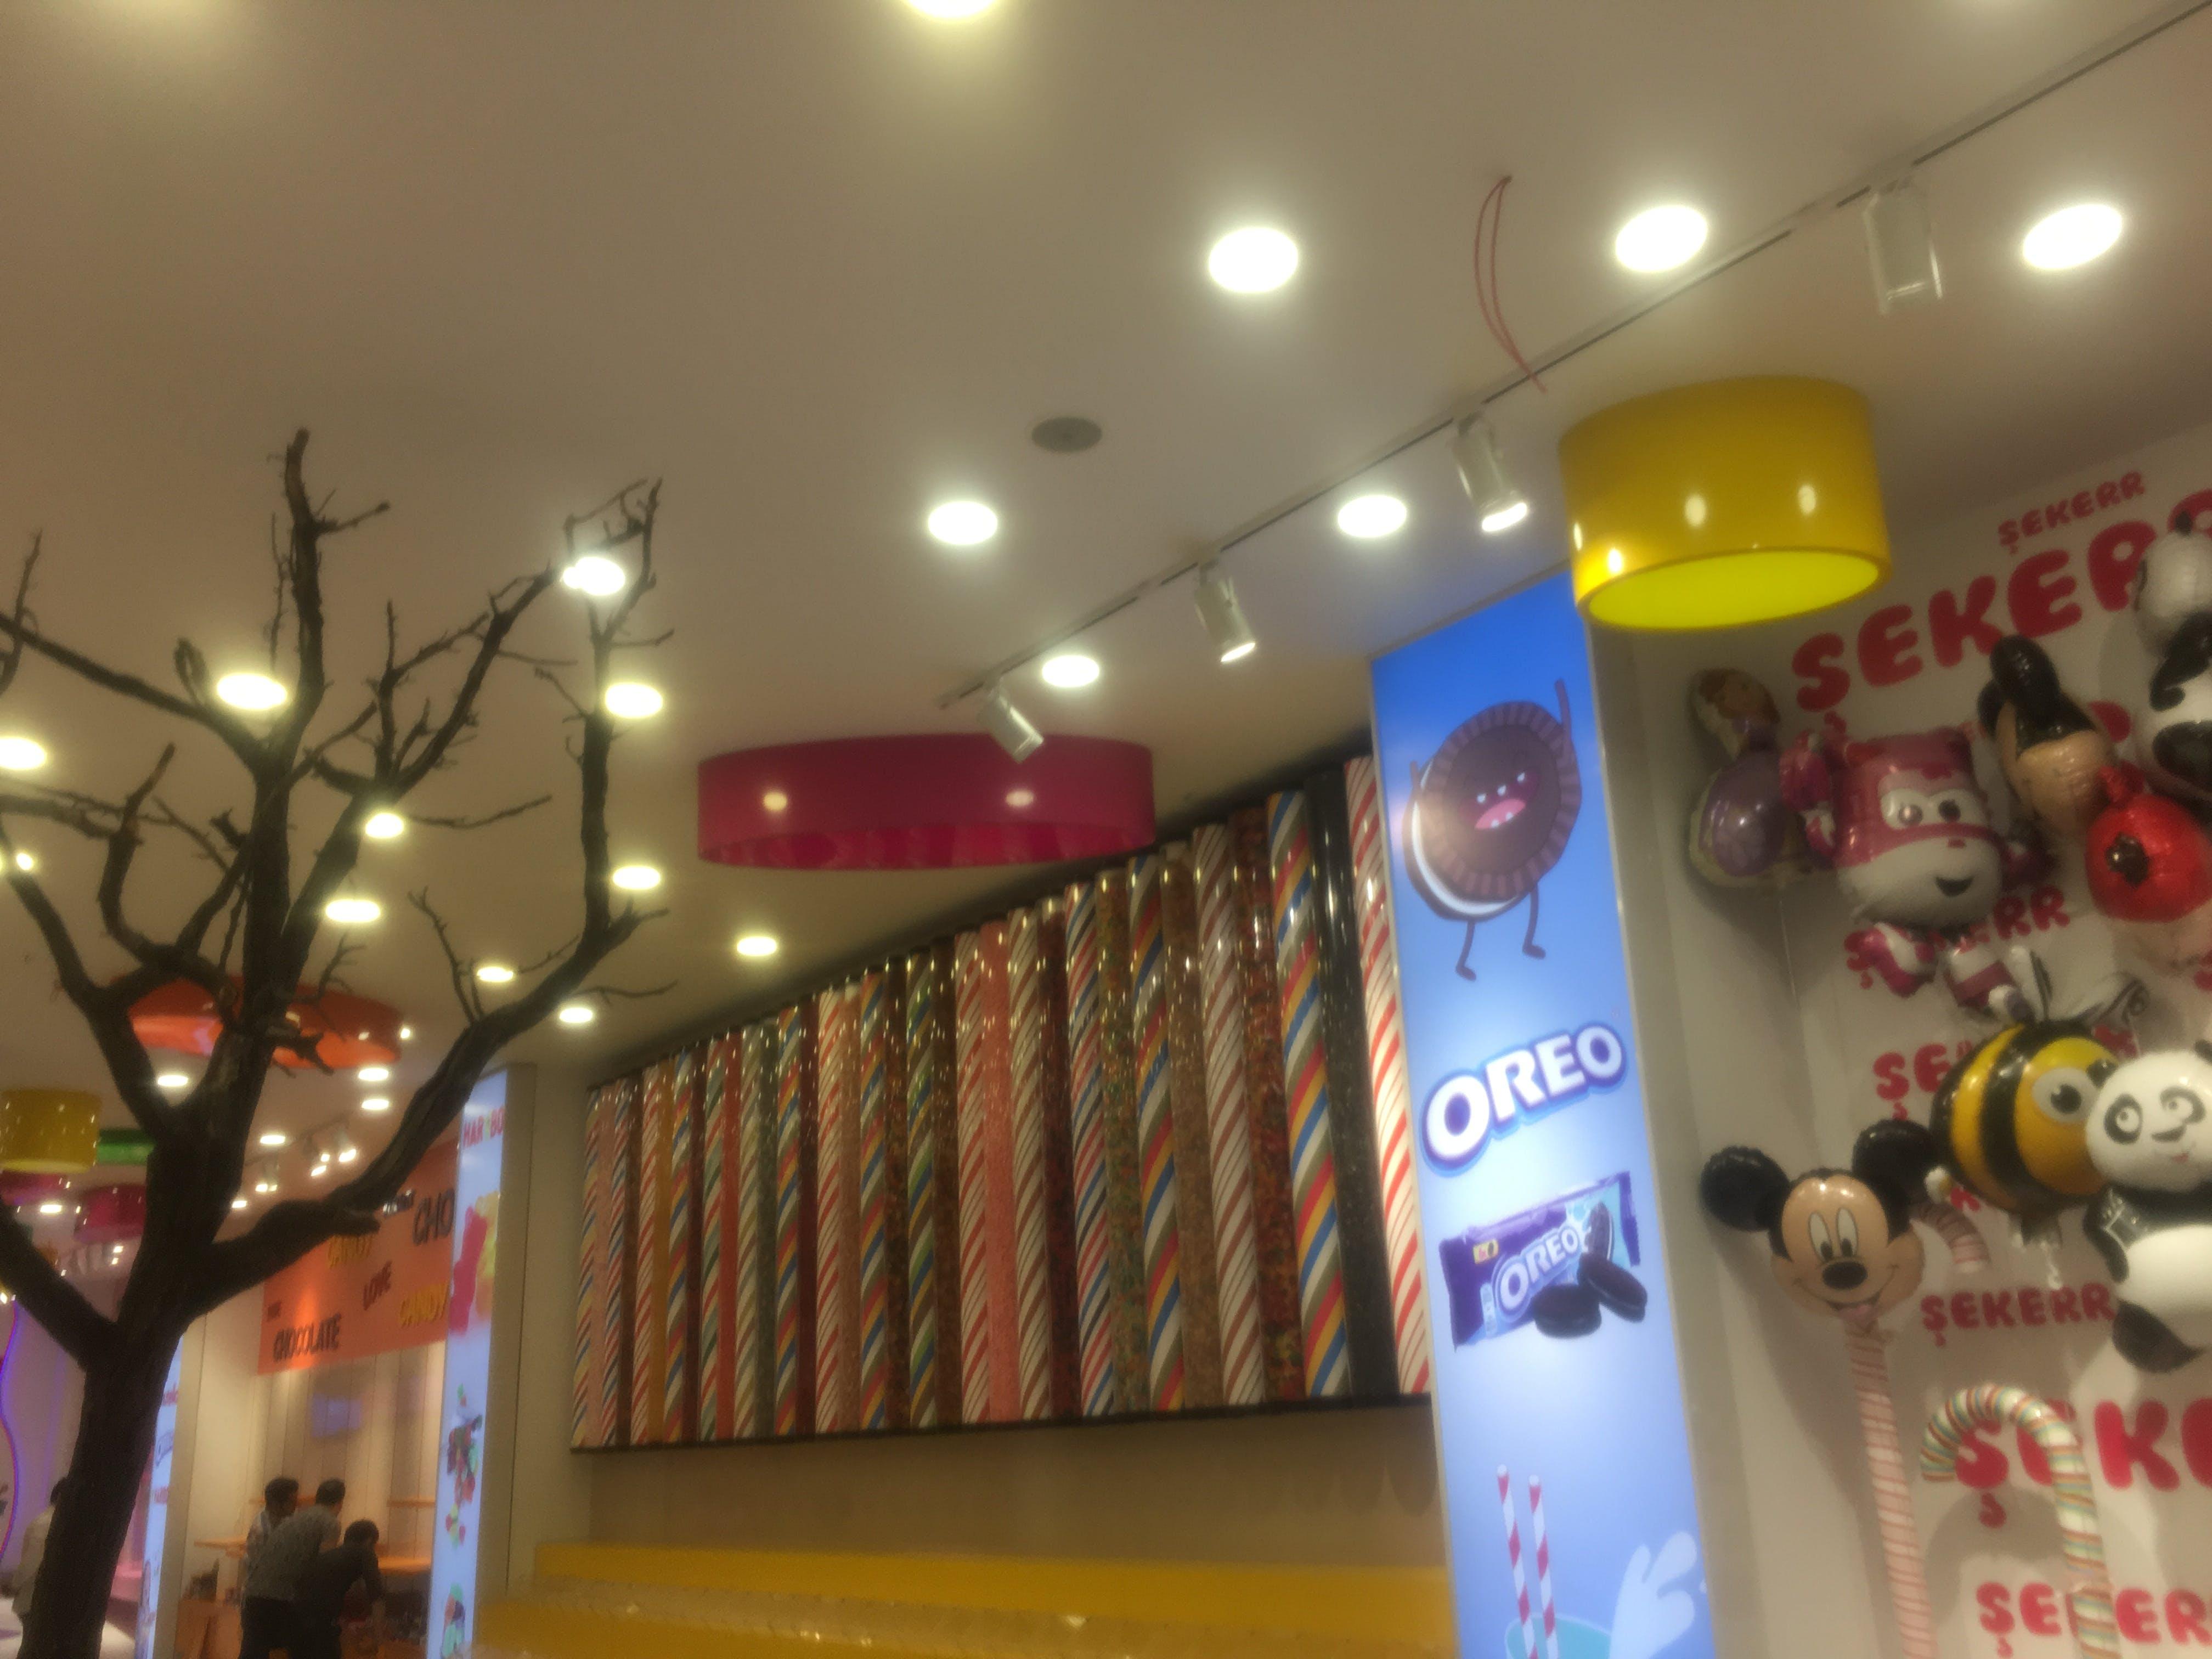 Mickey Mouse Balloon Beside Oreo Poster